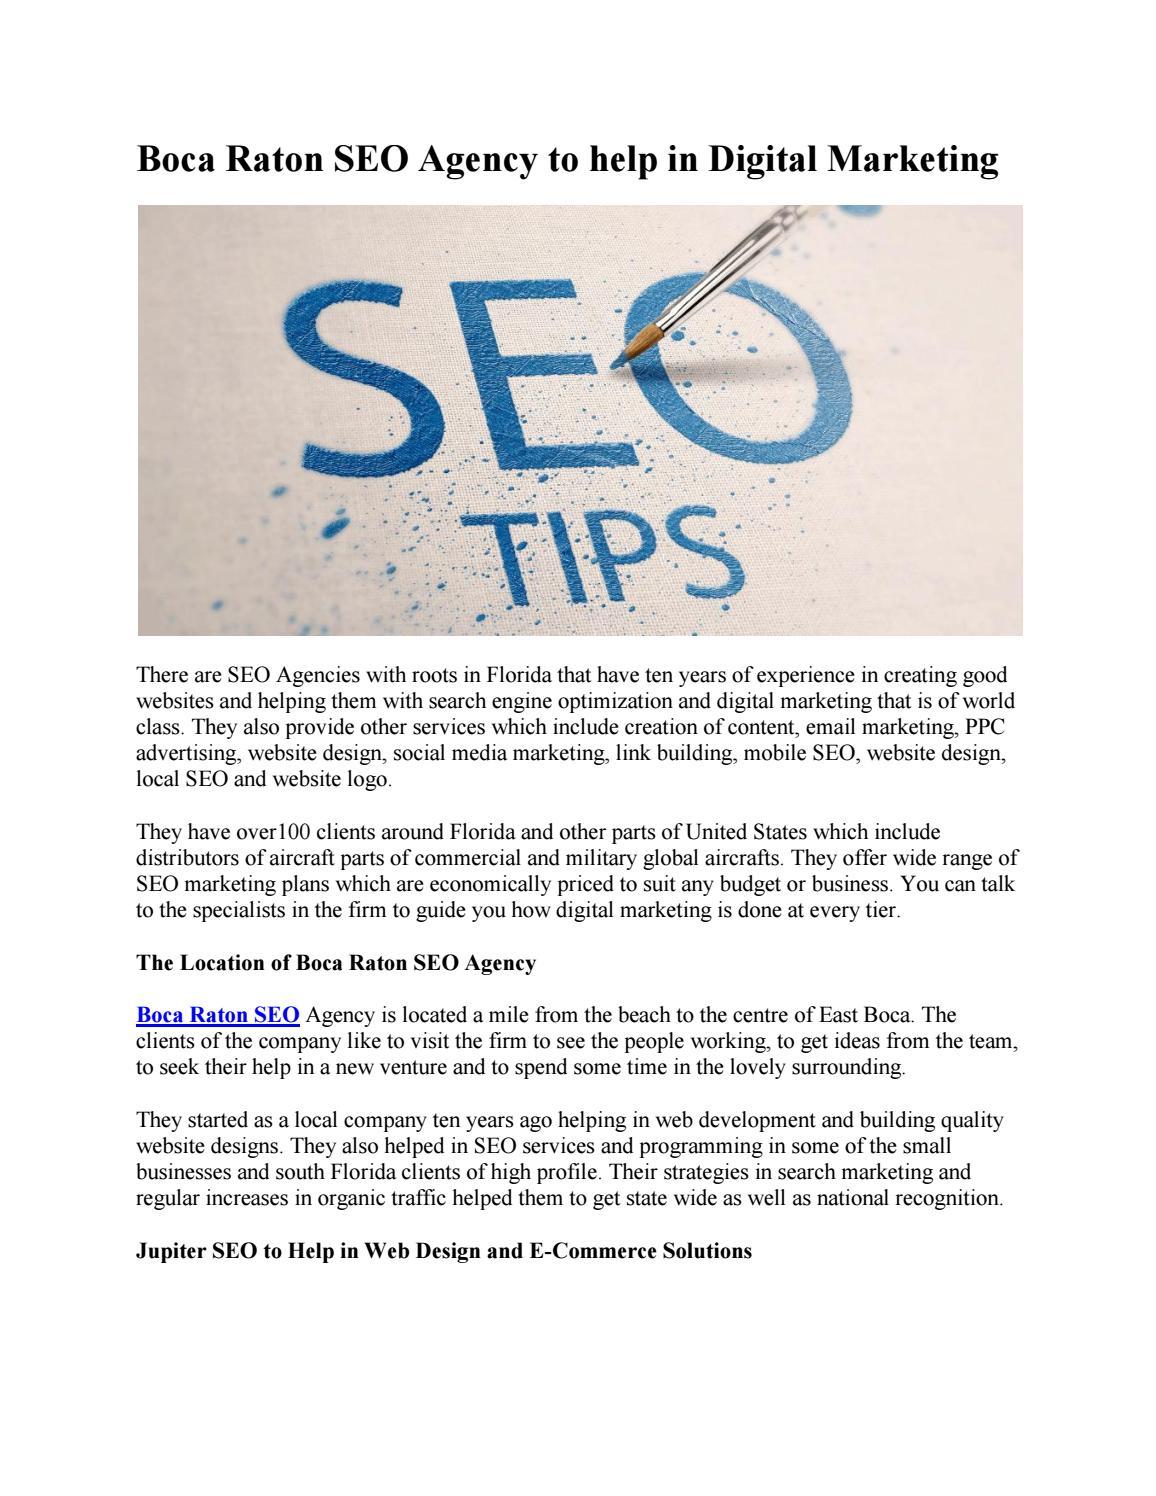 Boca raton seo agency to help in digital marketing by 561 Website